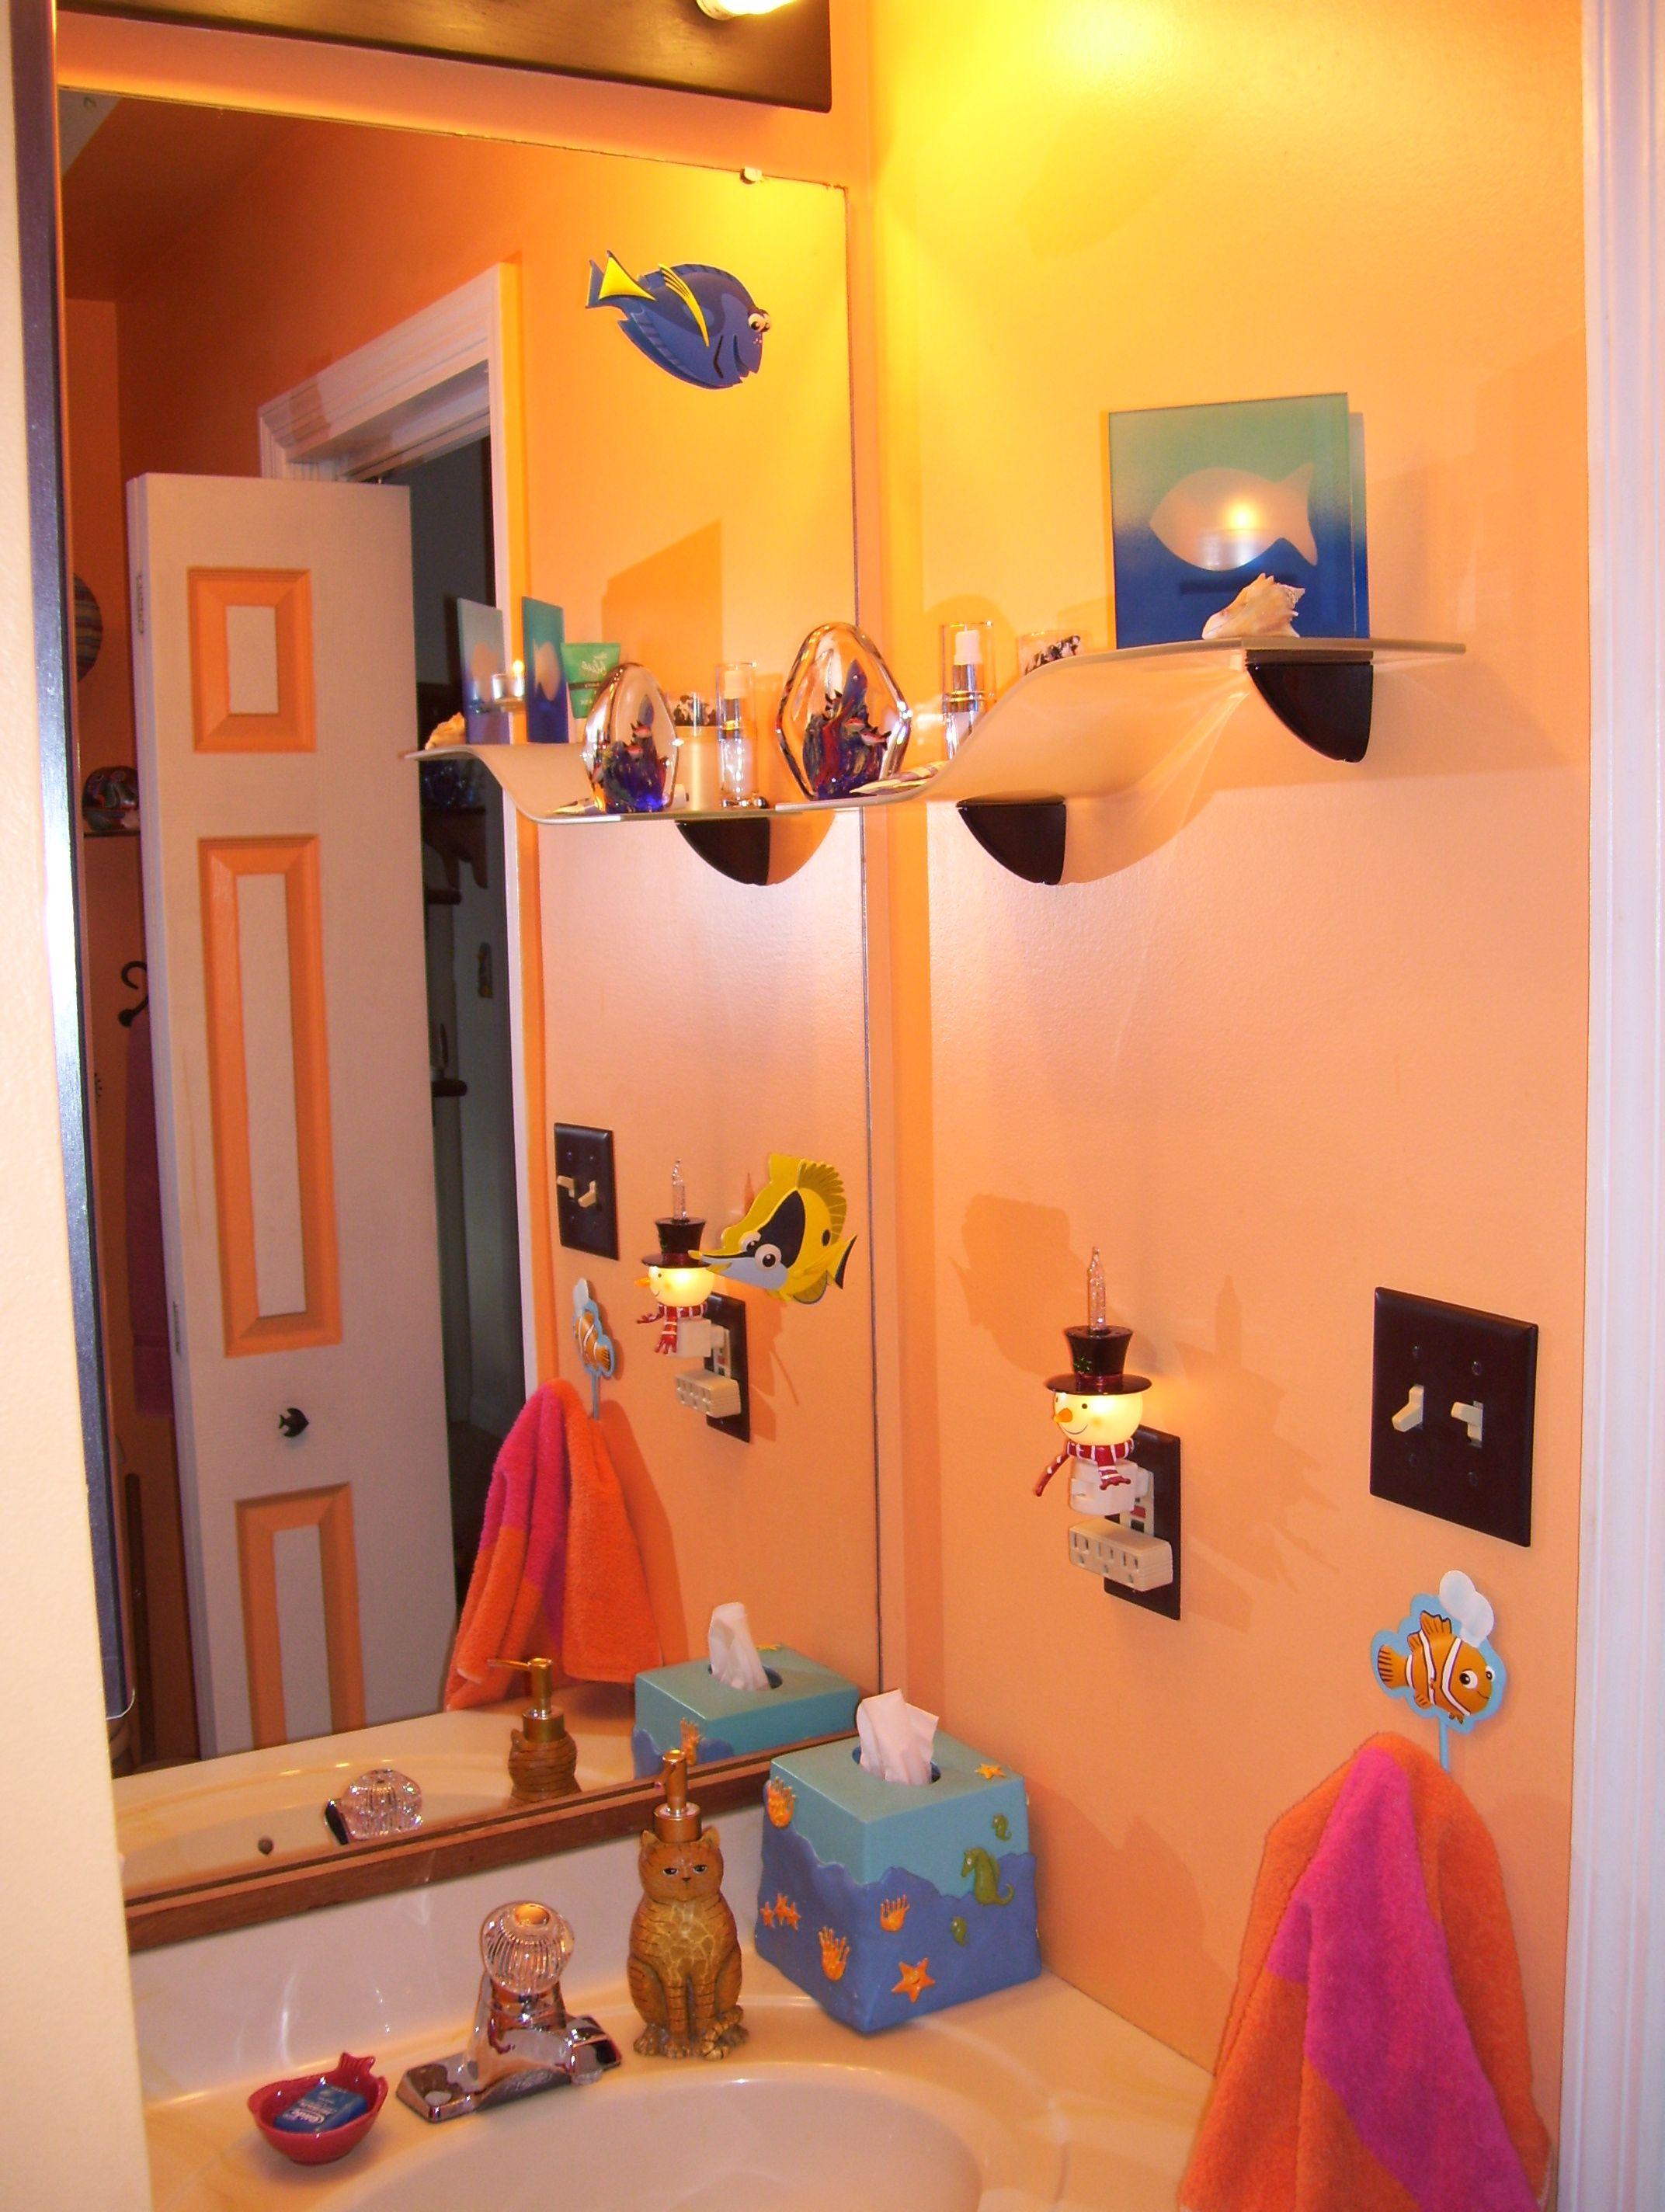 My Tropical Fish Bathroom Fish Bathroom Fishing Bathroom Decor Bathroom Decor Tropical fish bathroom decor